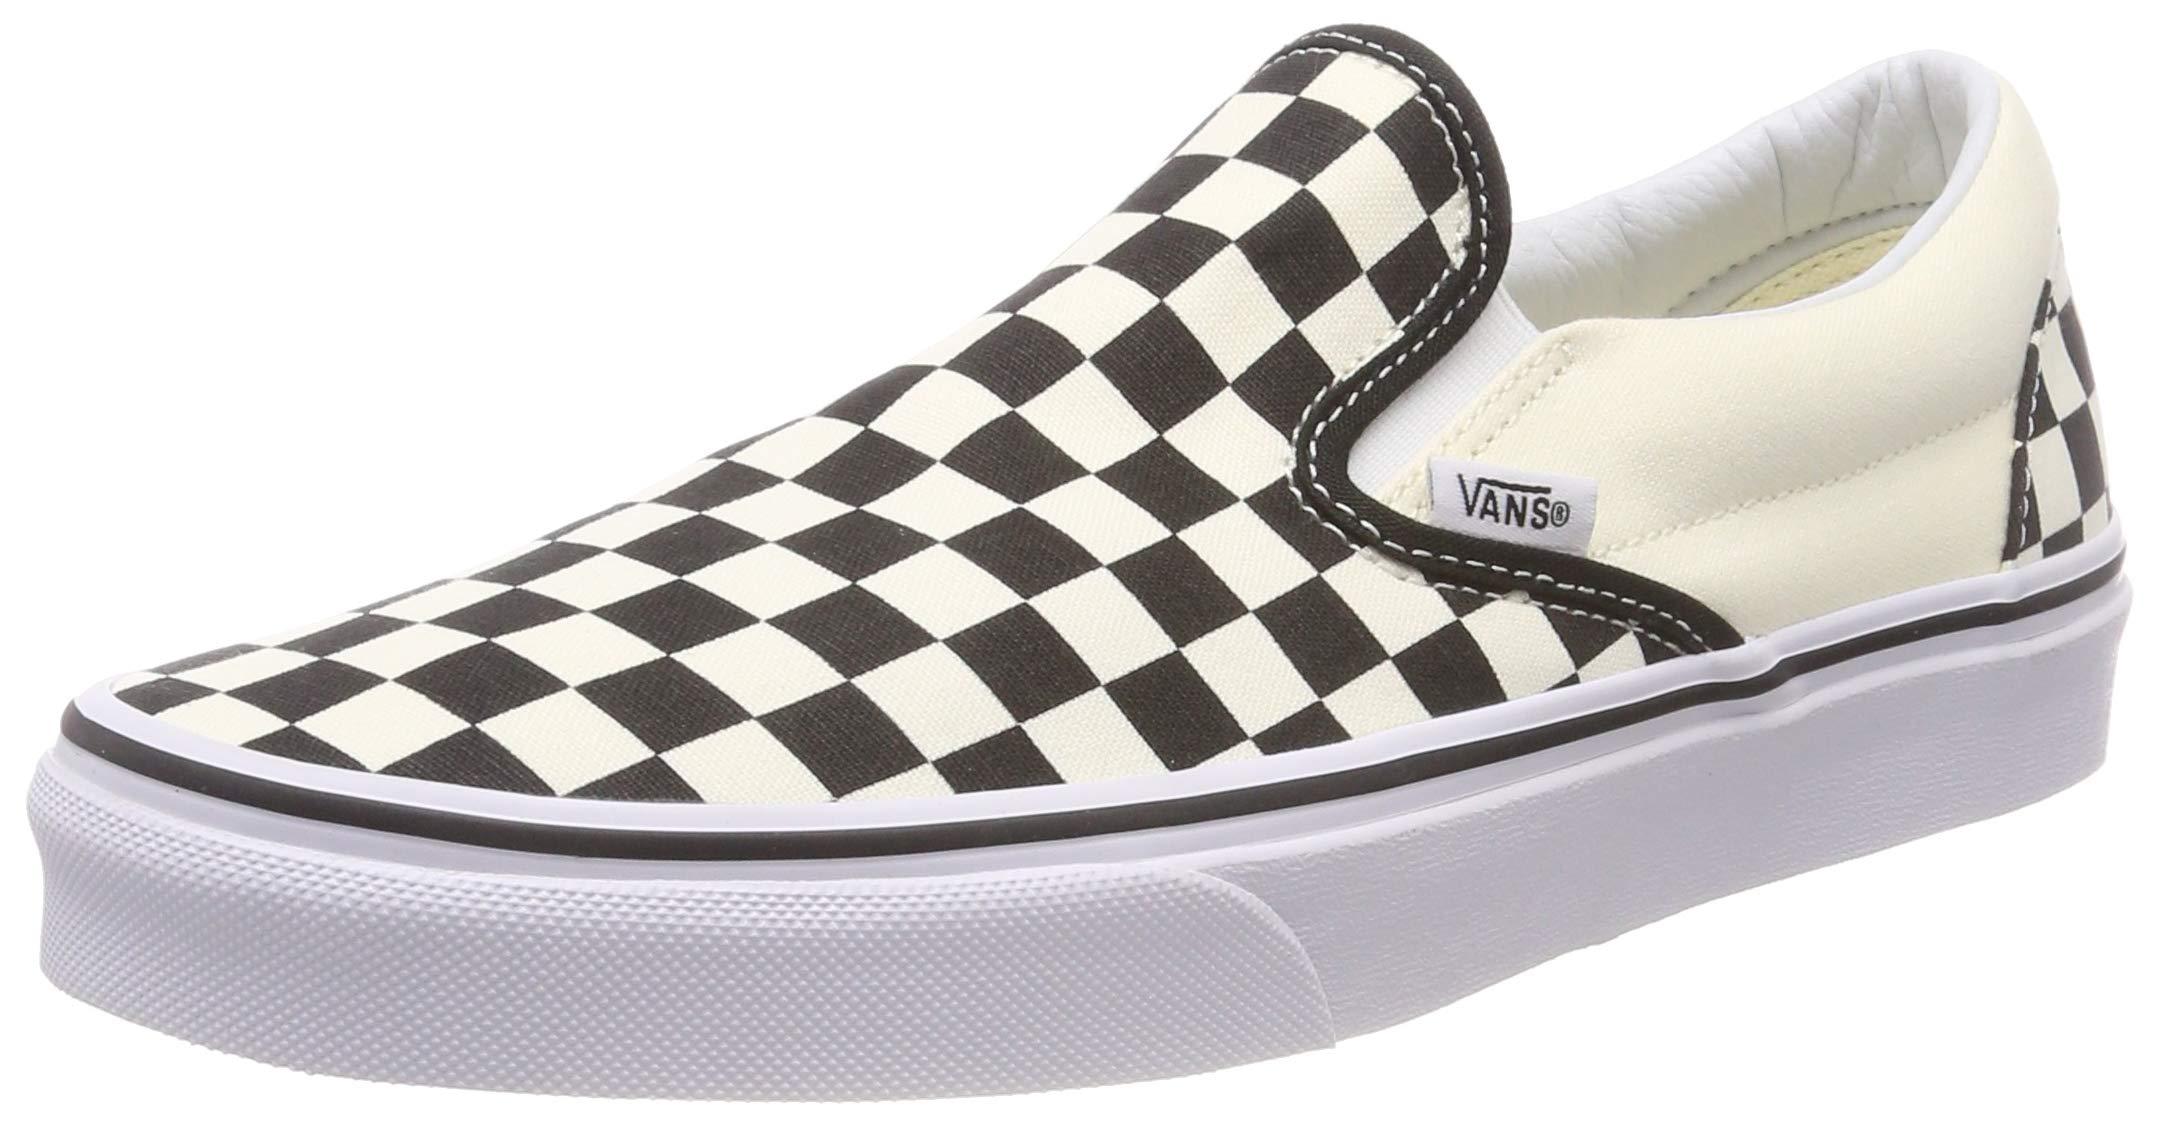 Vans Unisex Adults' Classic Slip On, Black/Off White Check, 8.5 UK by Vans